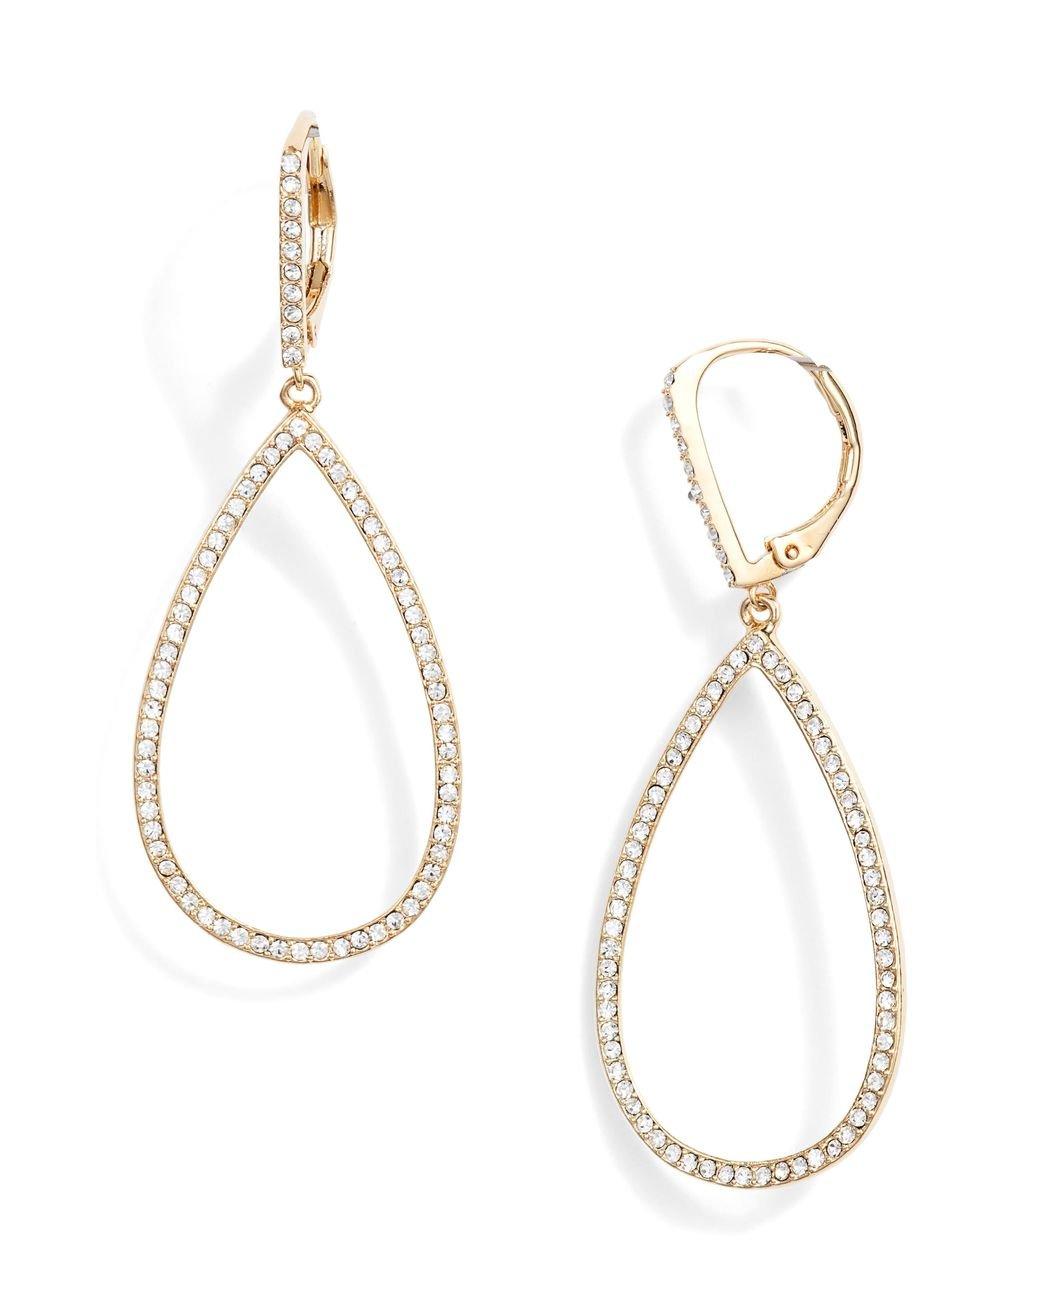 Pearlized Translucent Acetate Teardrop dangle Earrings